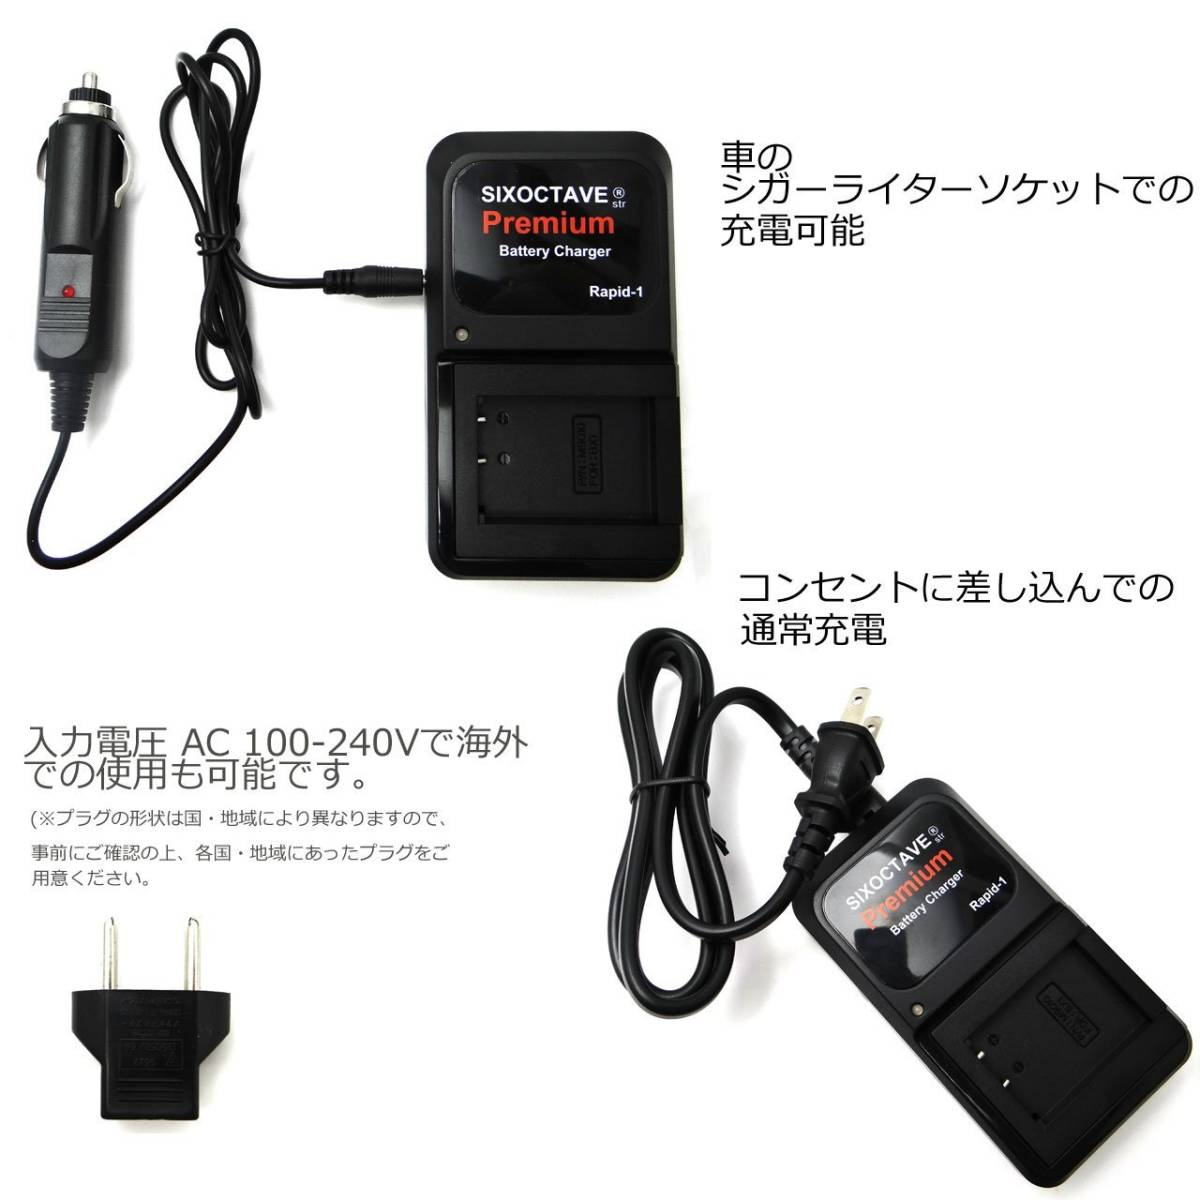 Panasonicパナソニック VW-VBK180互換プレミアム充電器HDC-TM70/HDC-TM60/HDC-HS60/HDC-TM35/HDC-TM90/HDC-TM95/HDC-TM85/HDC-TM45_画像4